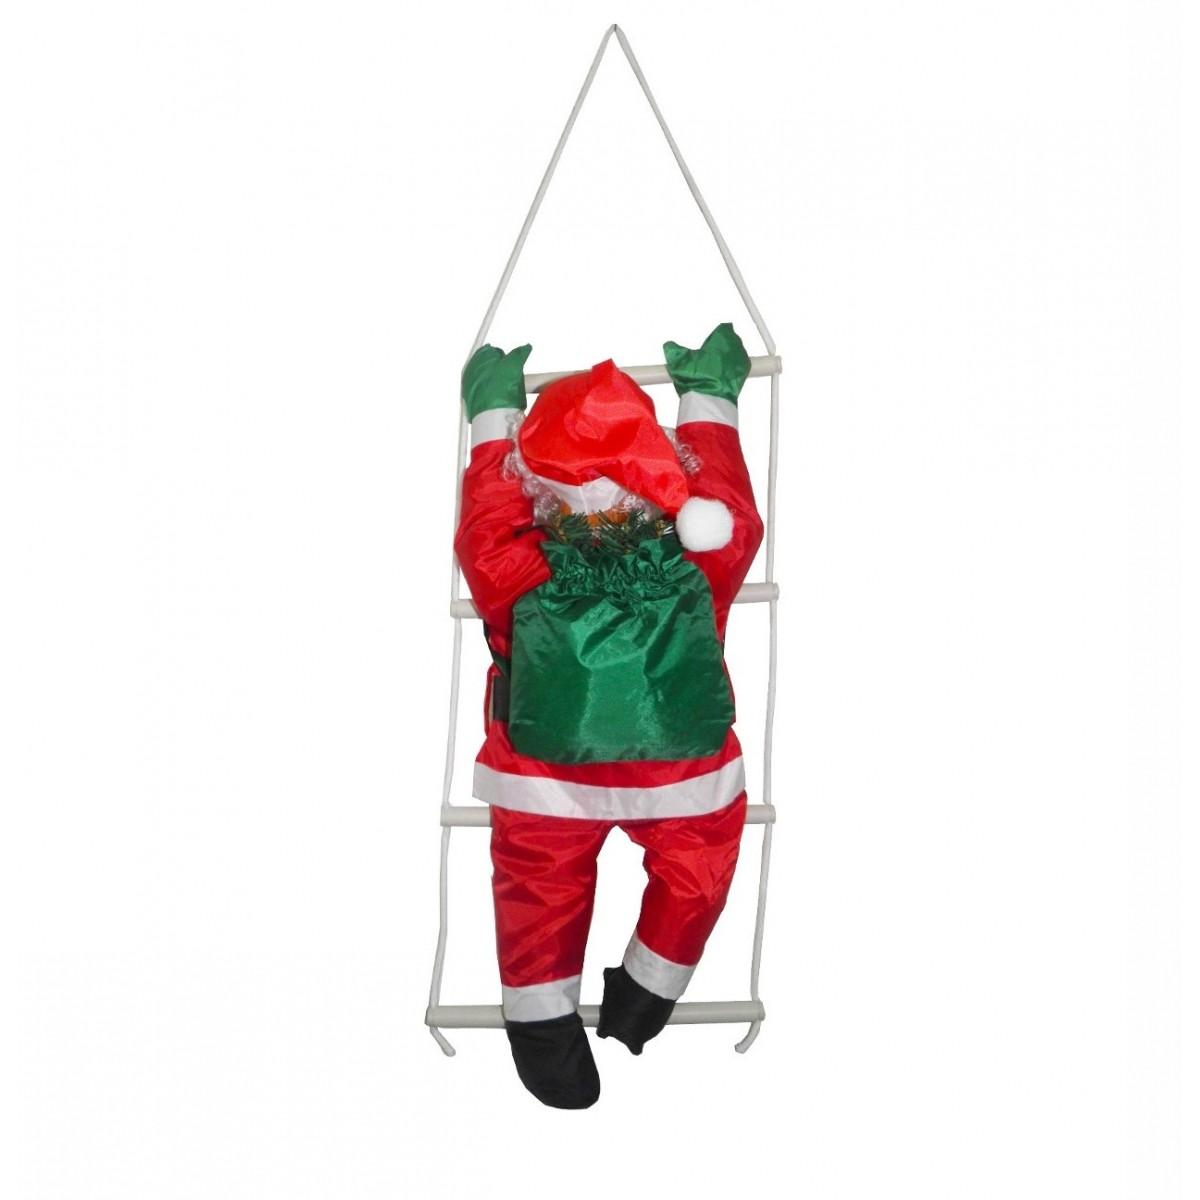 Papai Noel Subindo Escada Natal Decoracao Enfeite Natalino (BSL-36041-11)